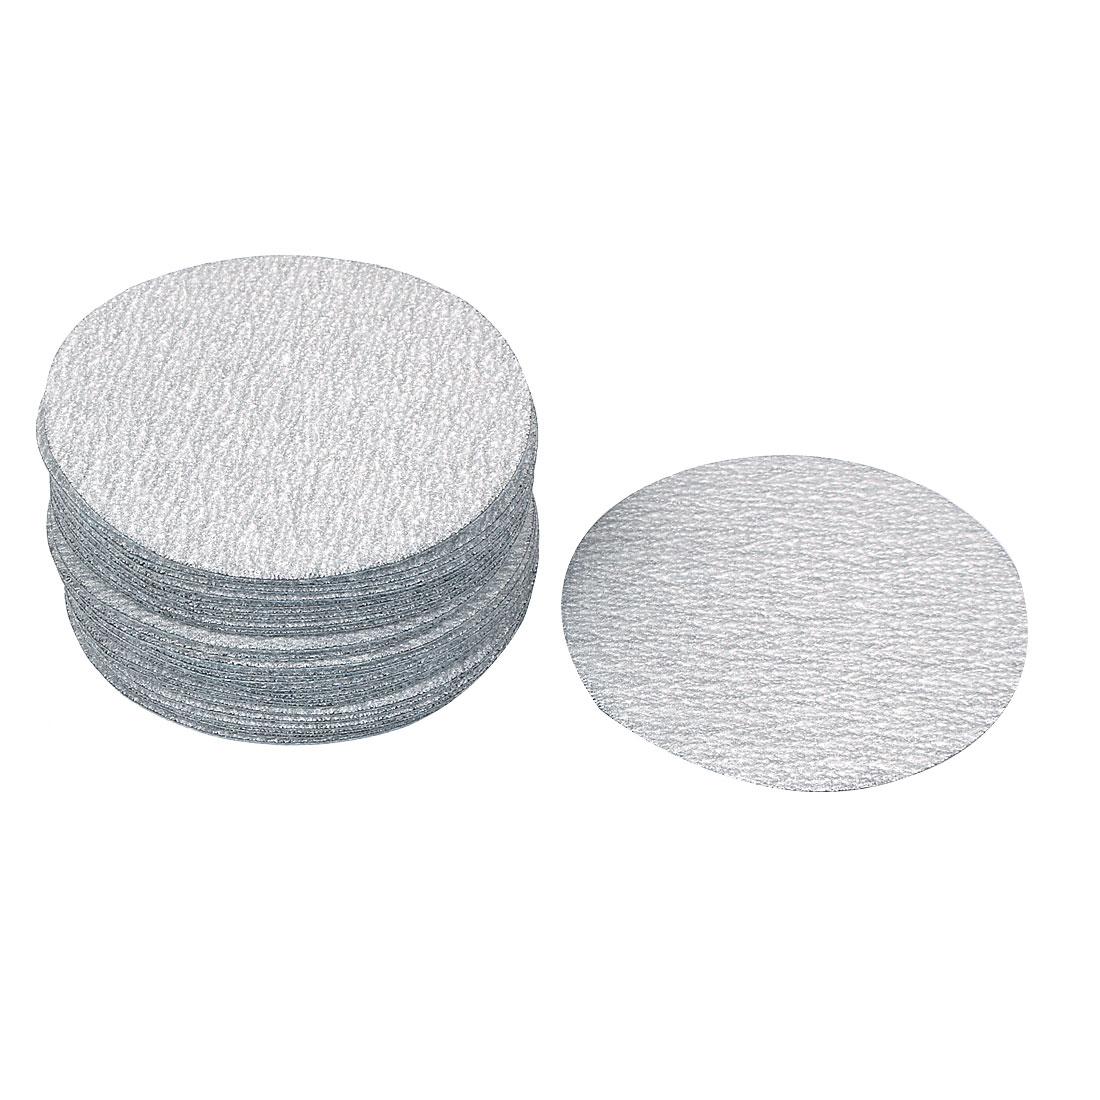 "3"" Dia Polishing Round Dry Abrasive Sanding Sandpaper Sheet Disc 320 Grit 30pcs"